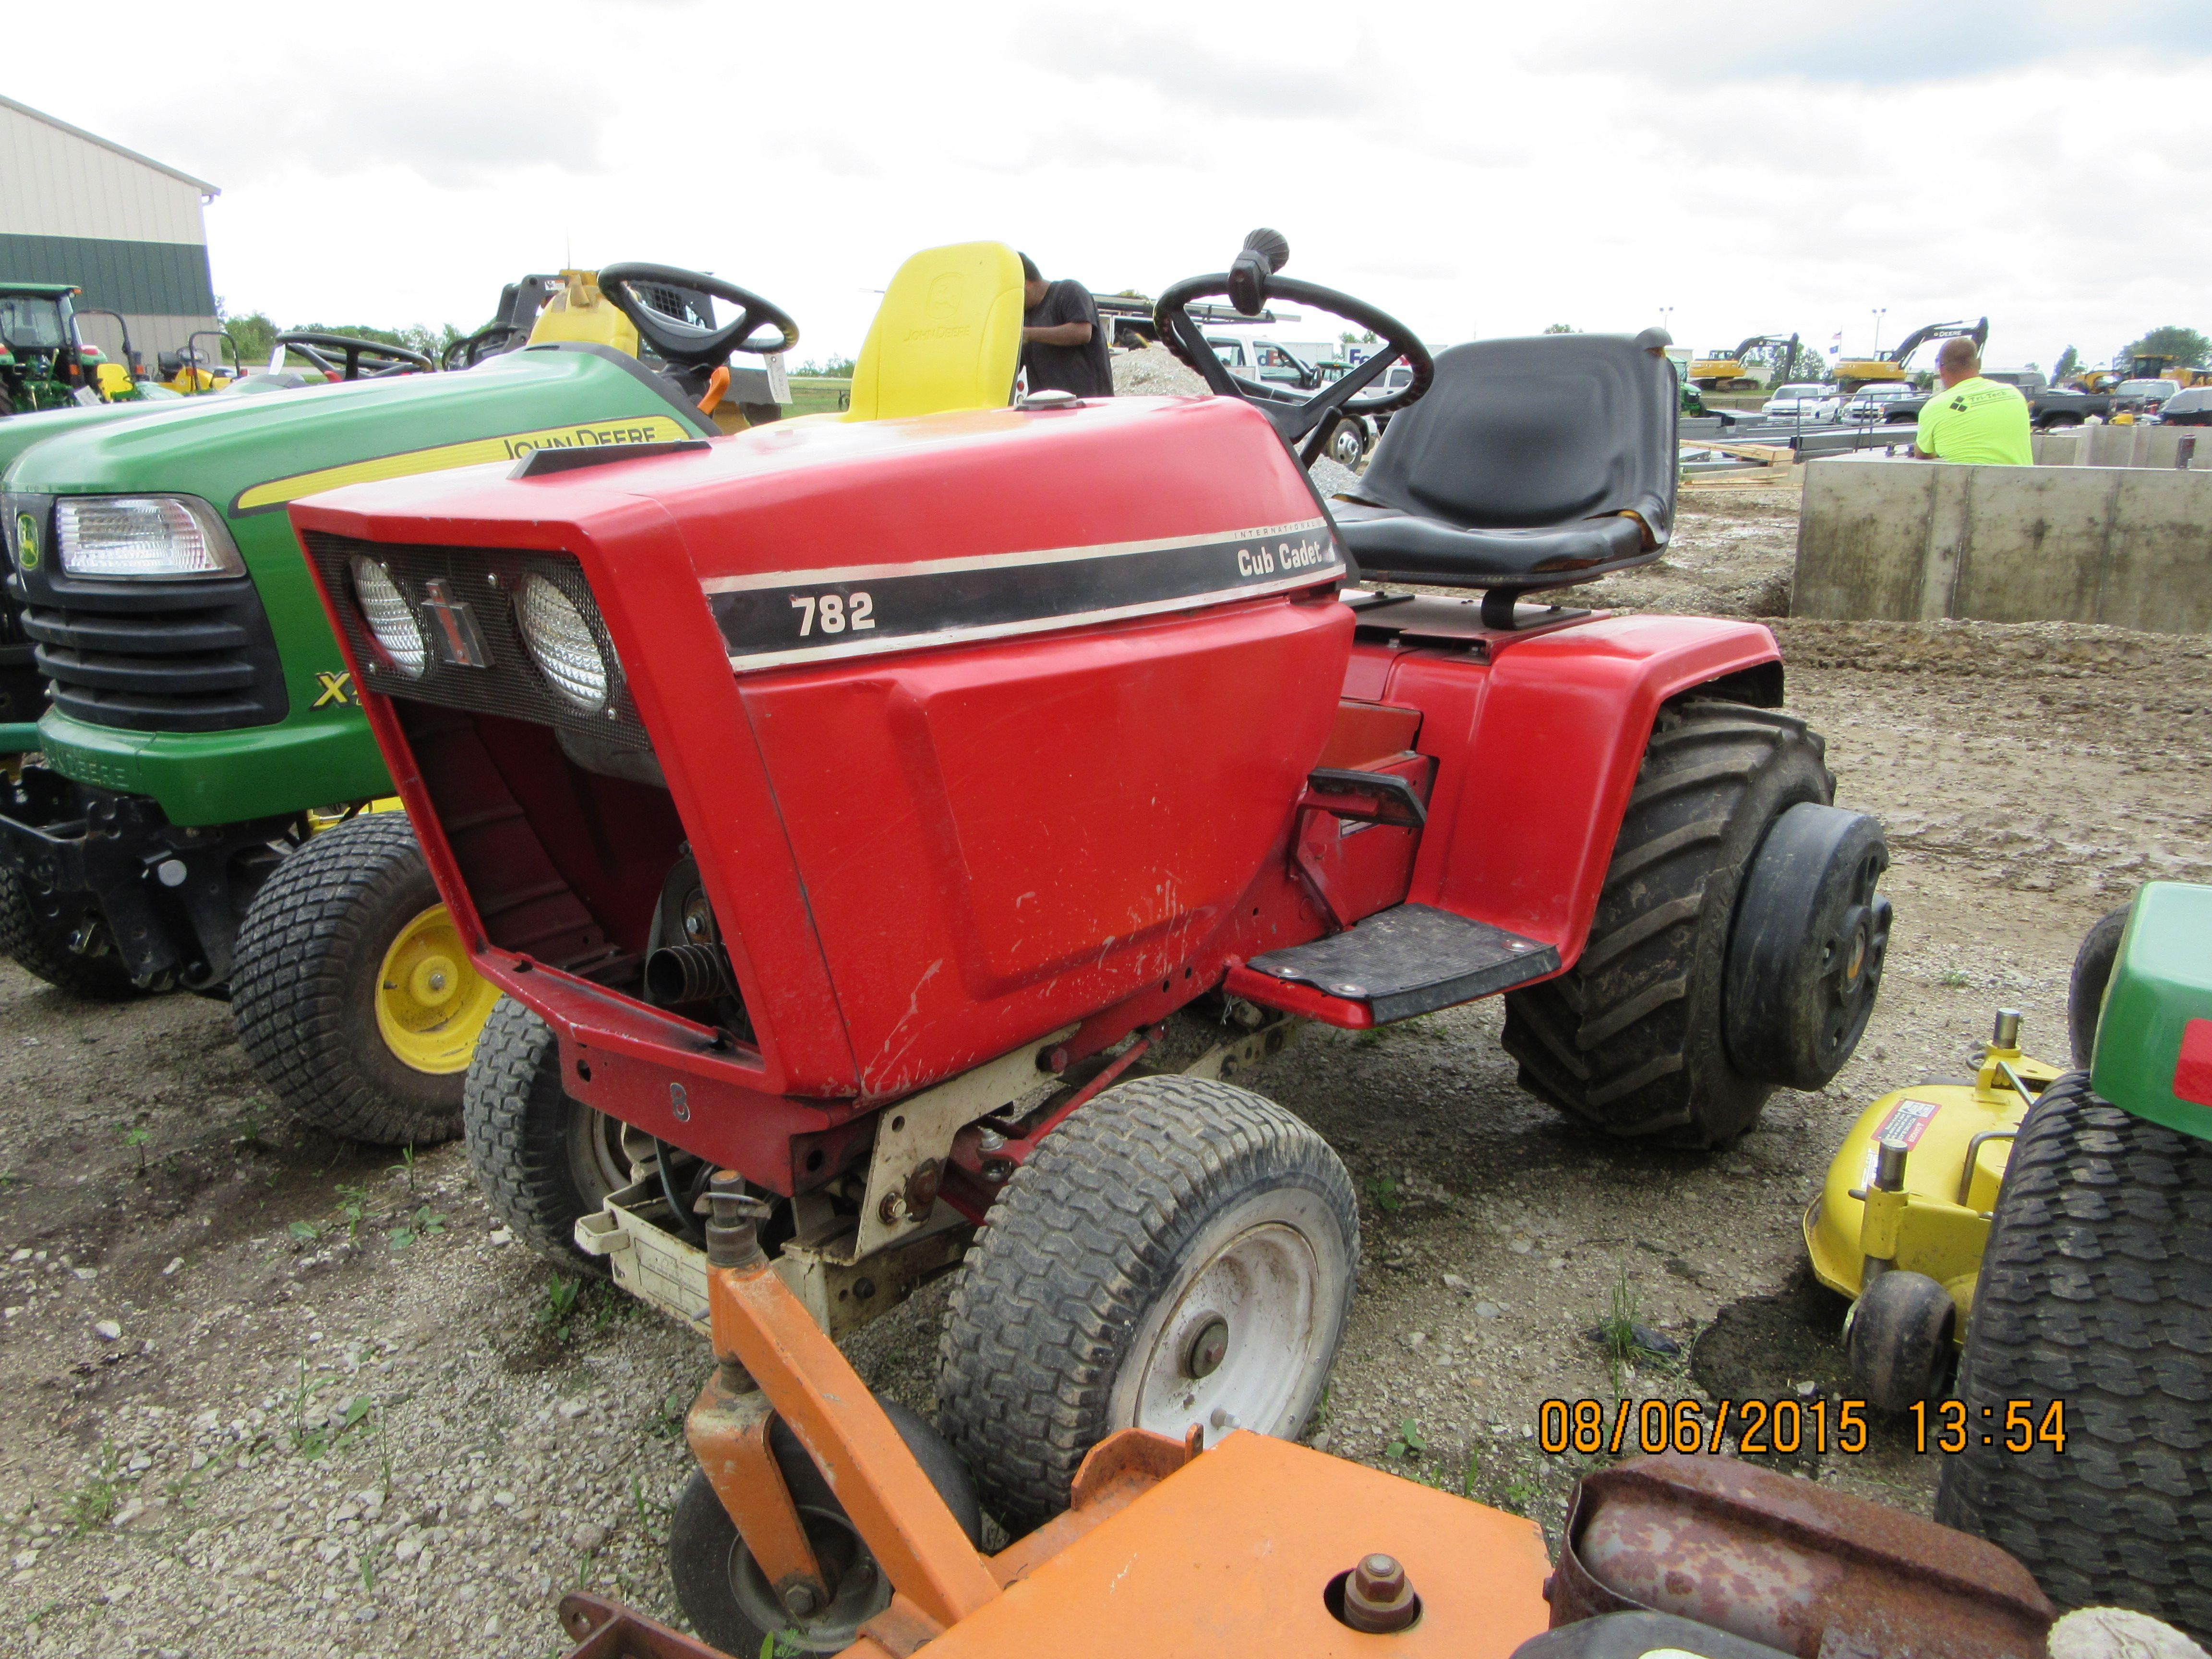 782 Cub Cadet Garden Tractor : International lawn garden tractor